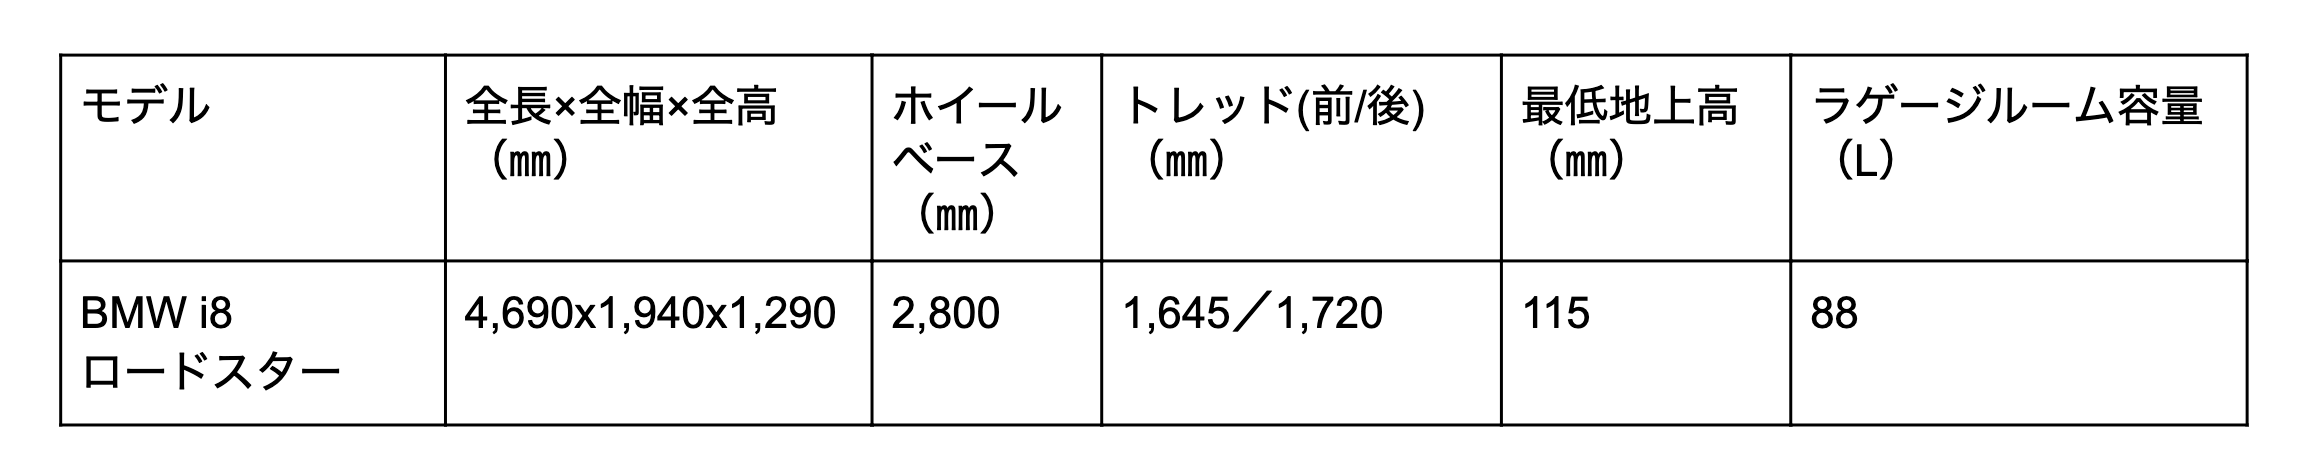 BMW i8 ロードスターの寸法表